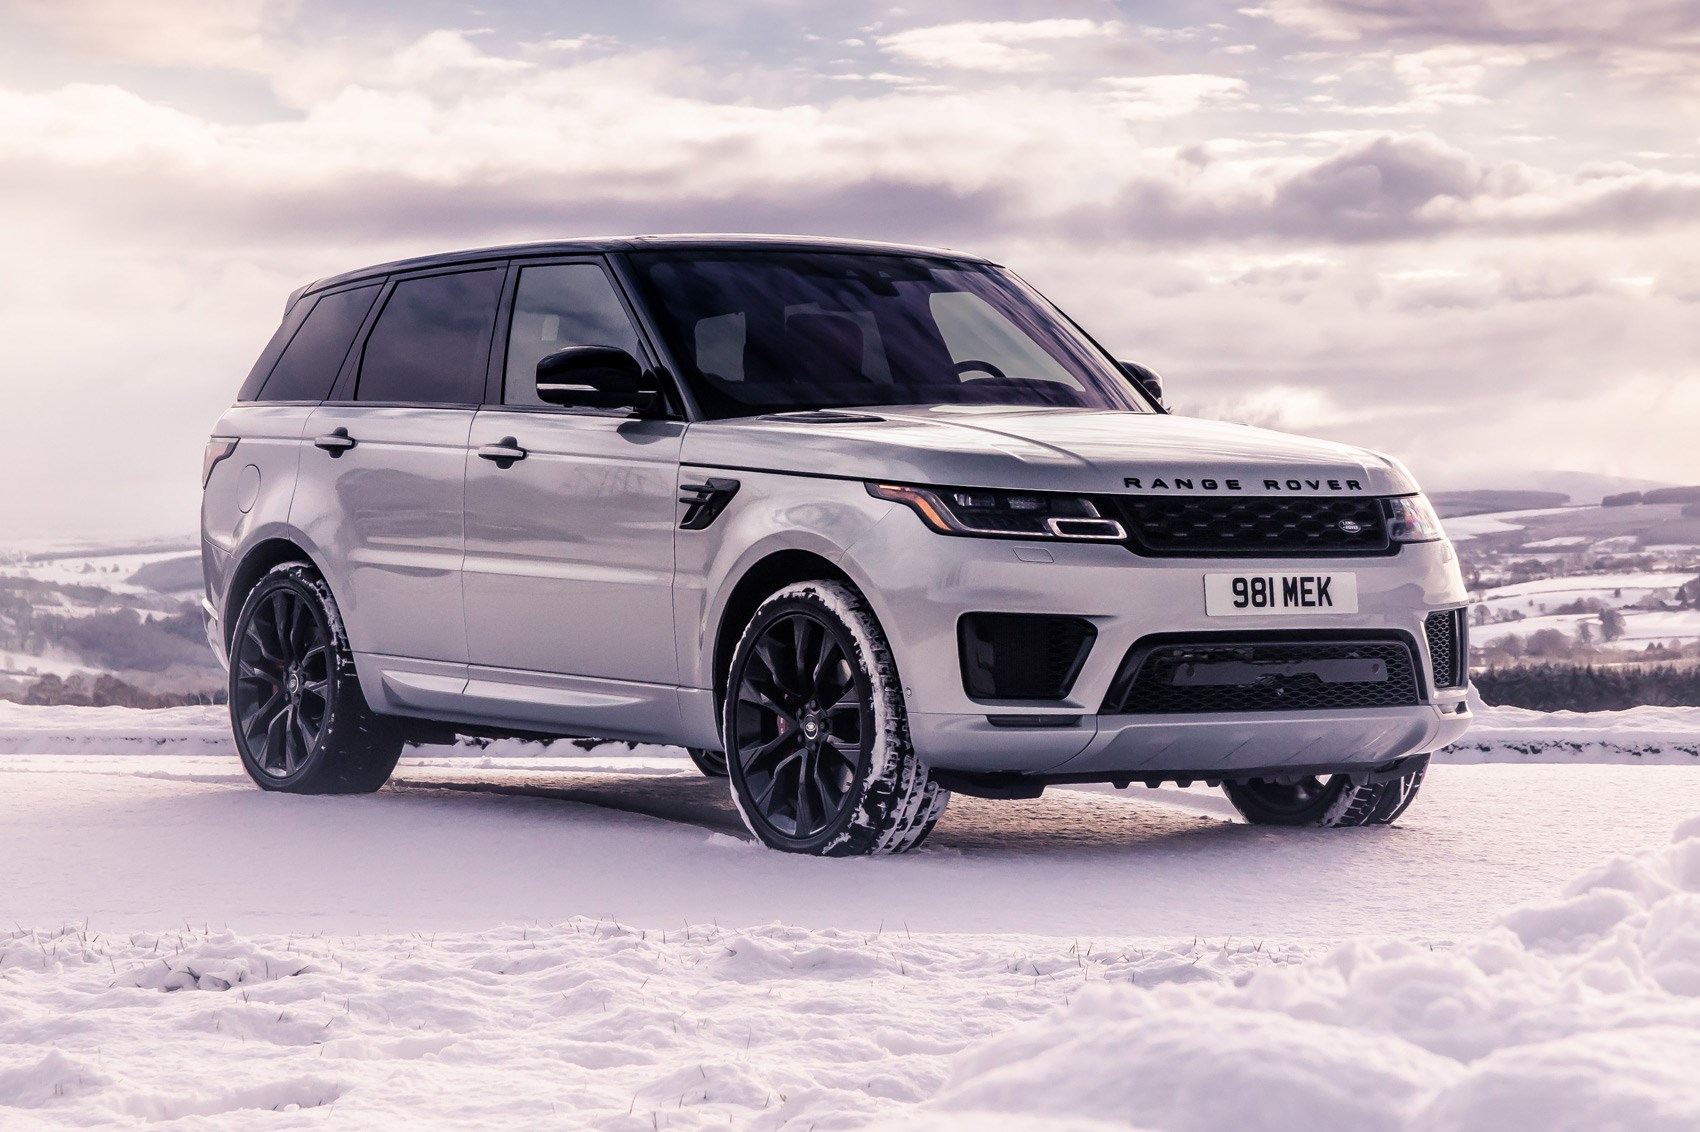 Land Rover Sport >> Range Rover Sport 2019 The Car Lowdown Car Magazine